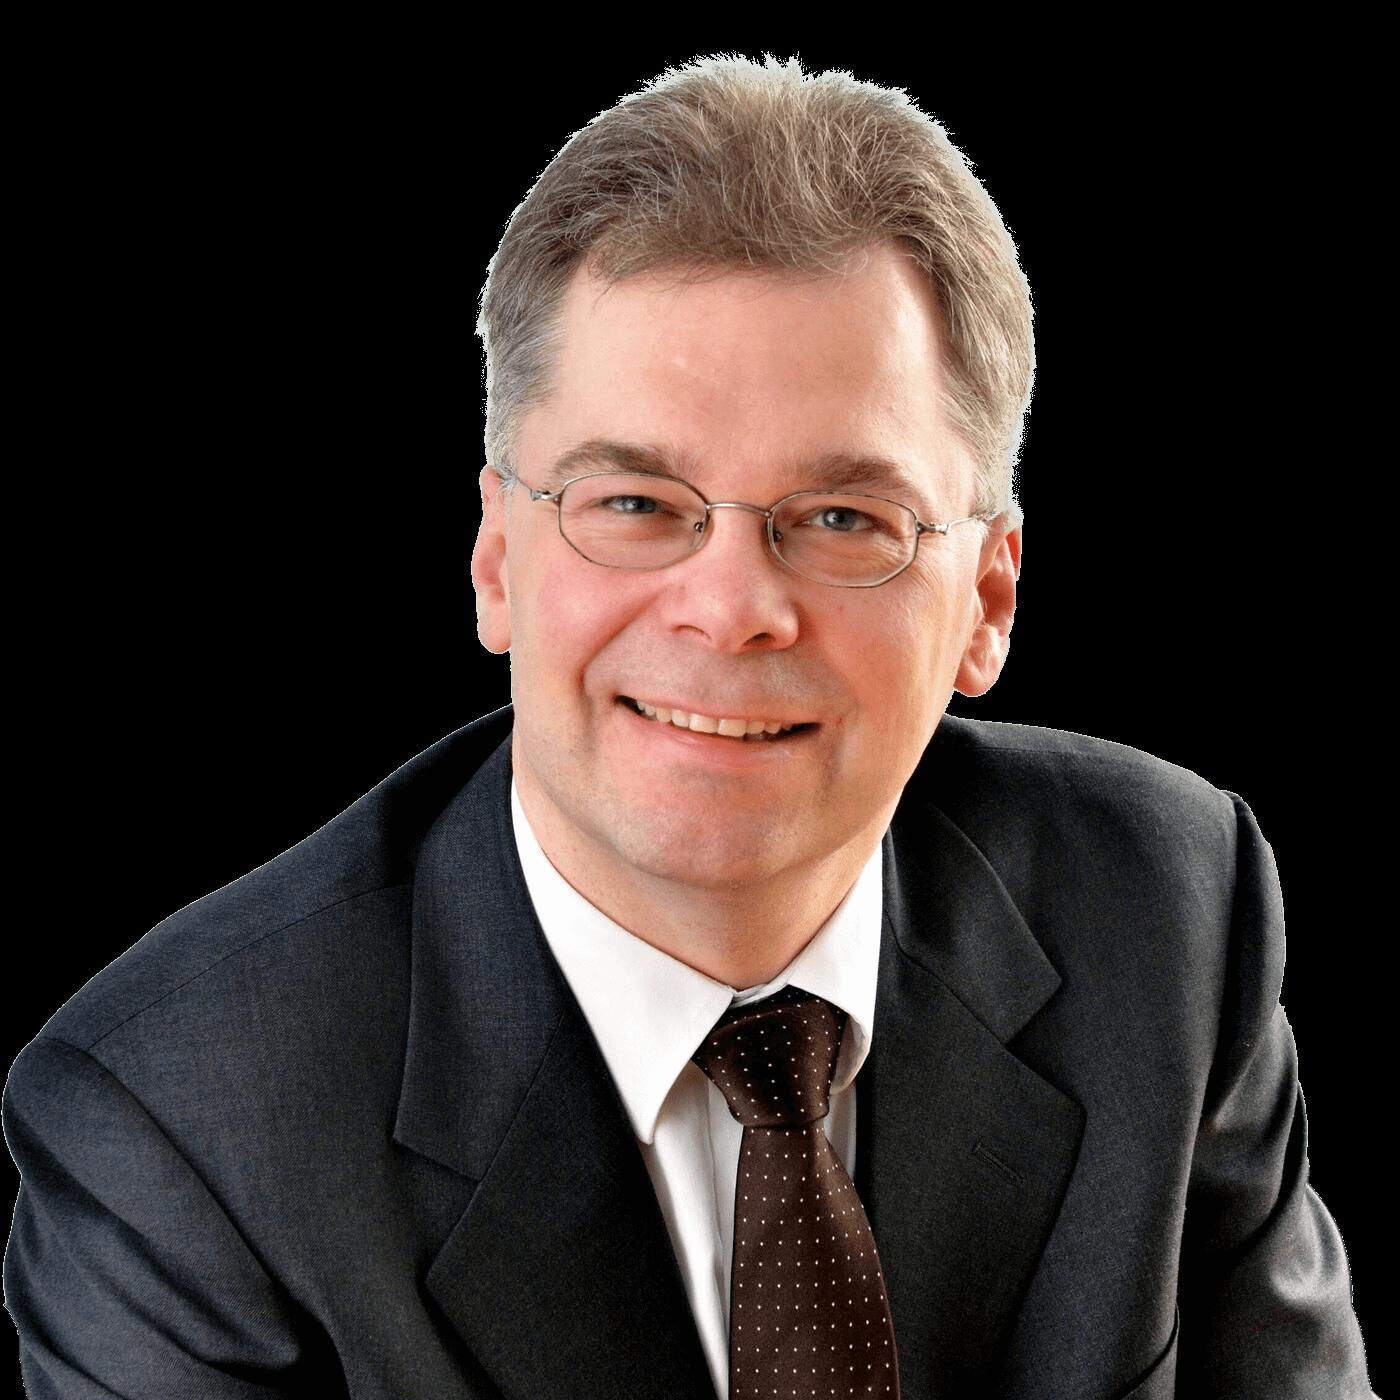 Dr. Alexander Büchel